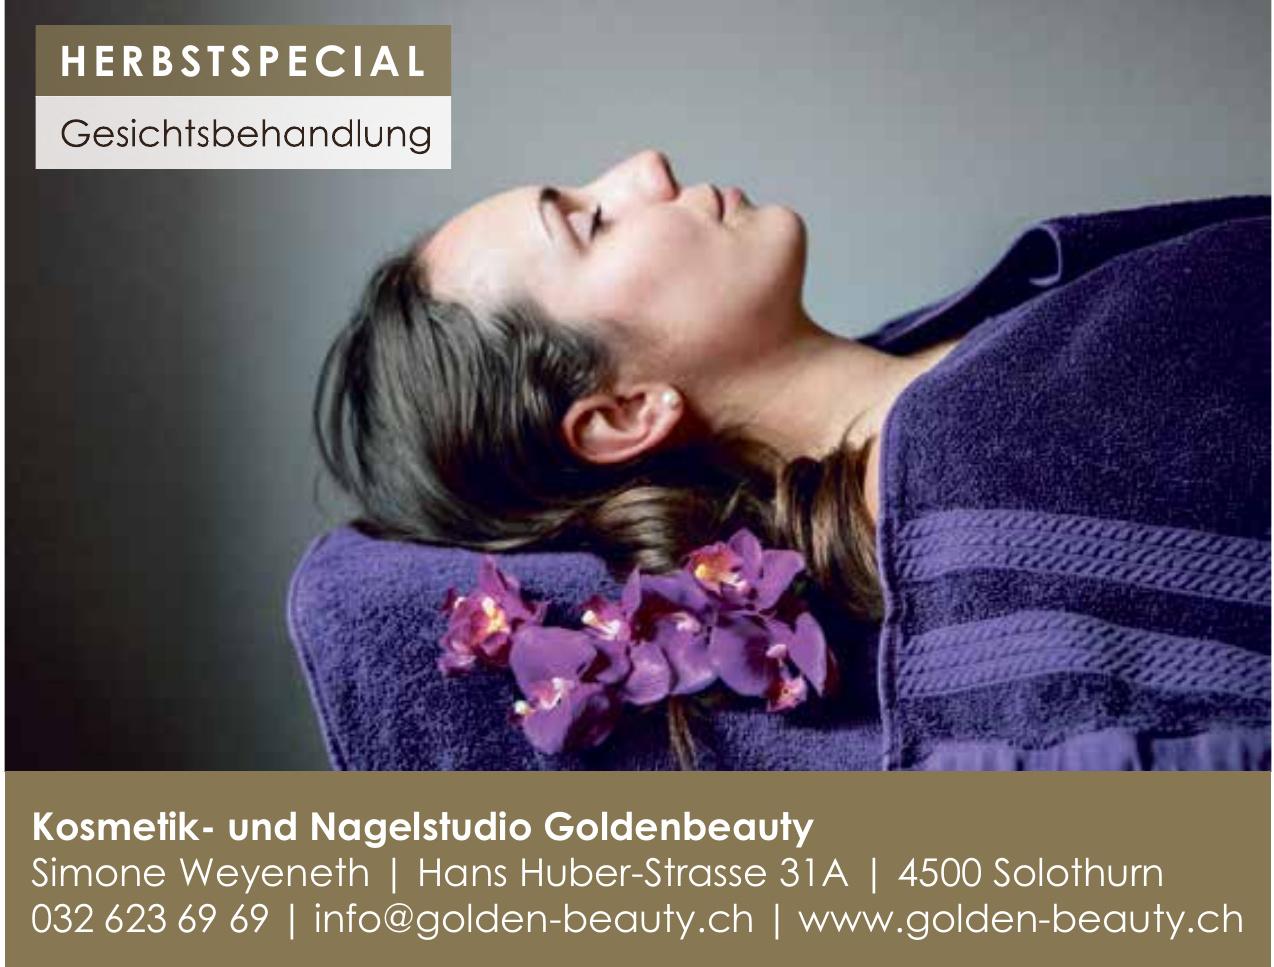 Kosmetik- und Nagelstudio Goldenbeauty Simone Weyeneth